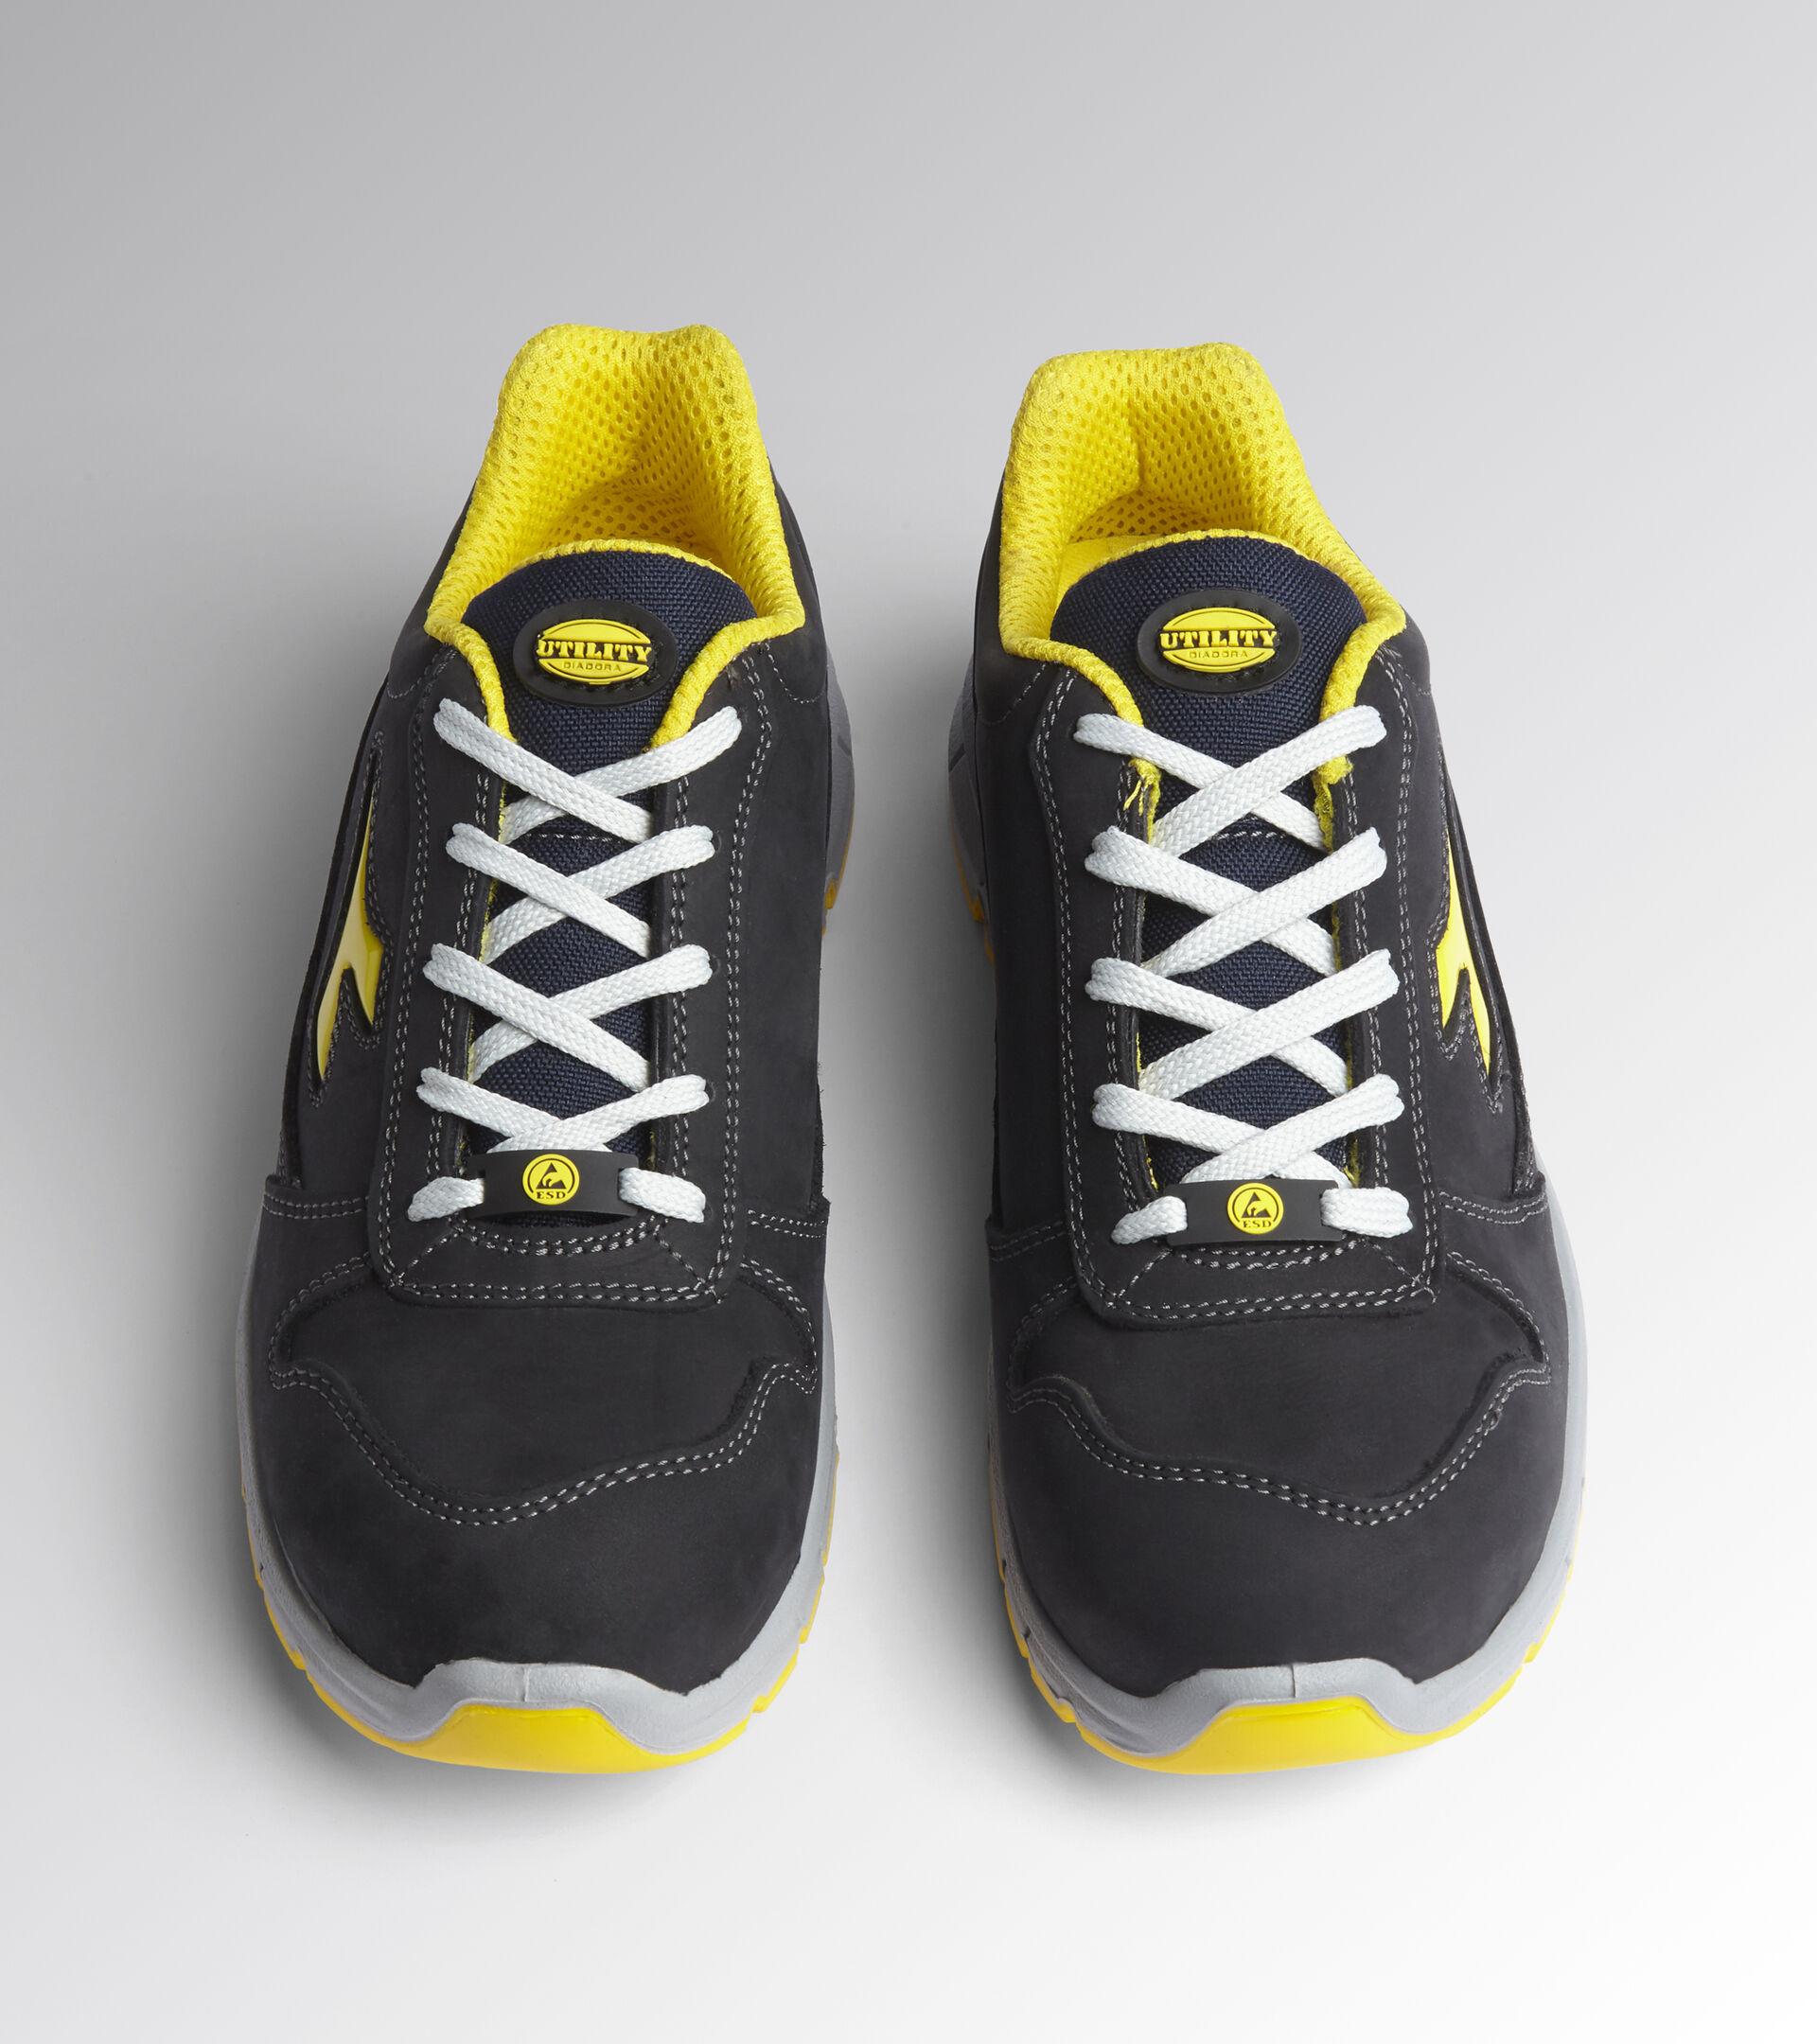 Footwear Utility UNISEX RUN LOW S3 SRC ESD DARK NAVY. Utility